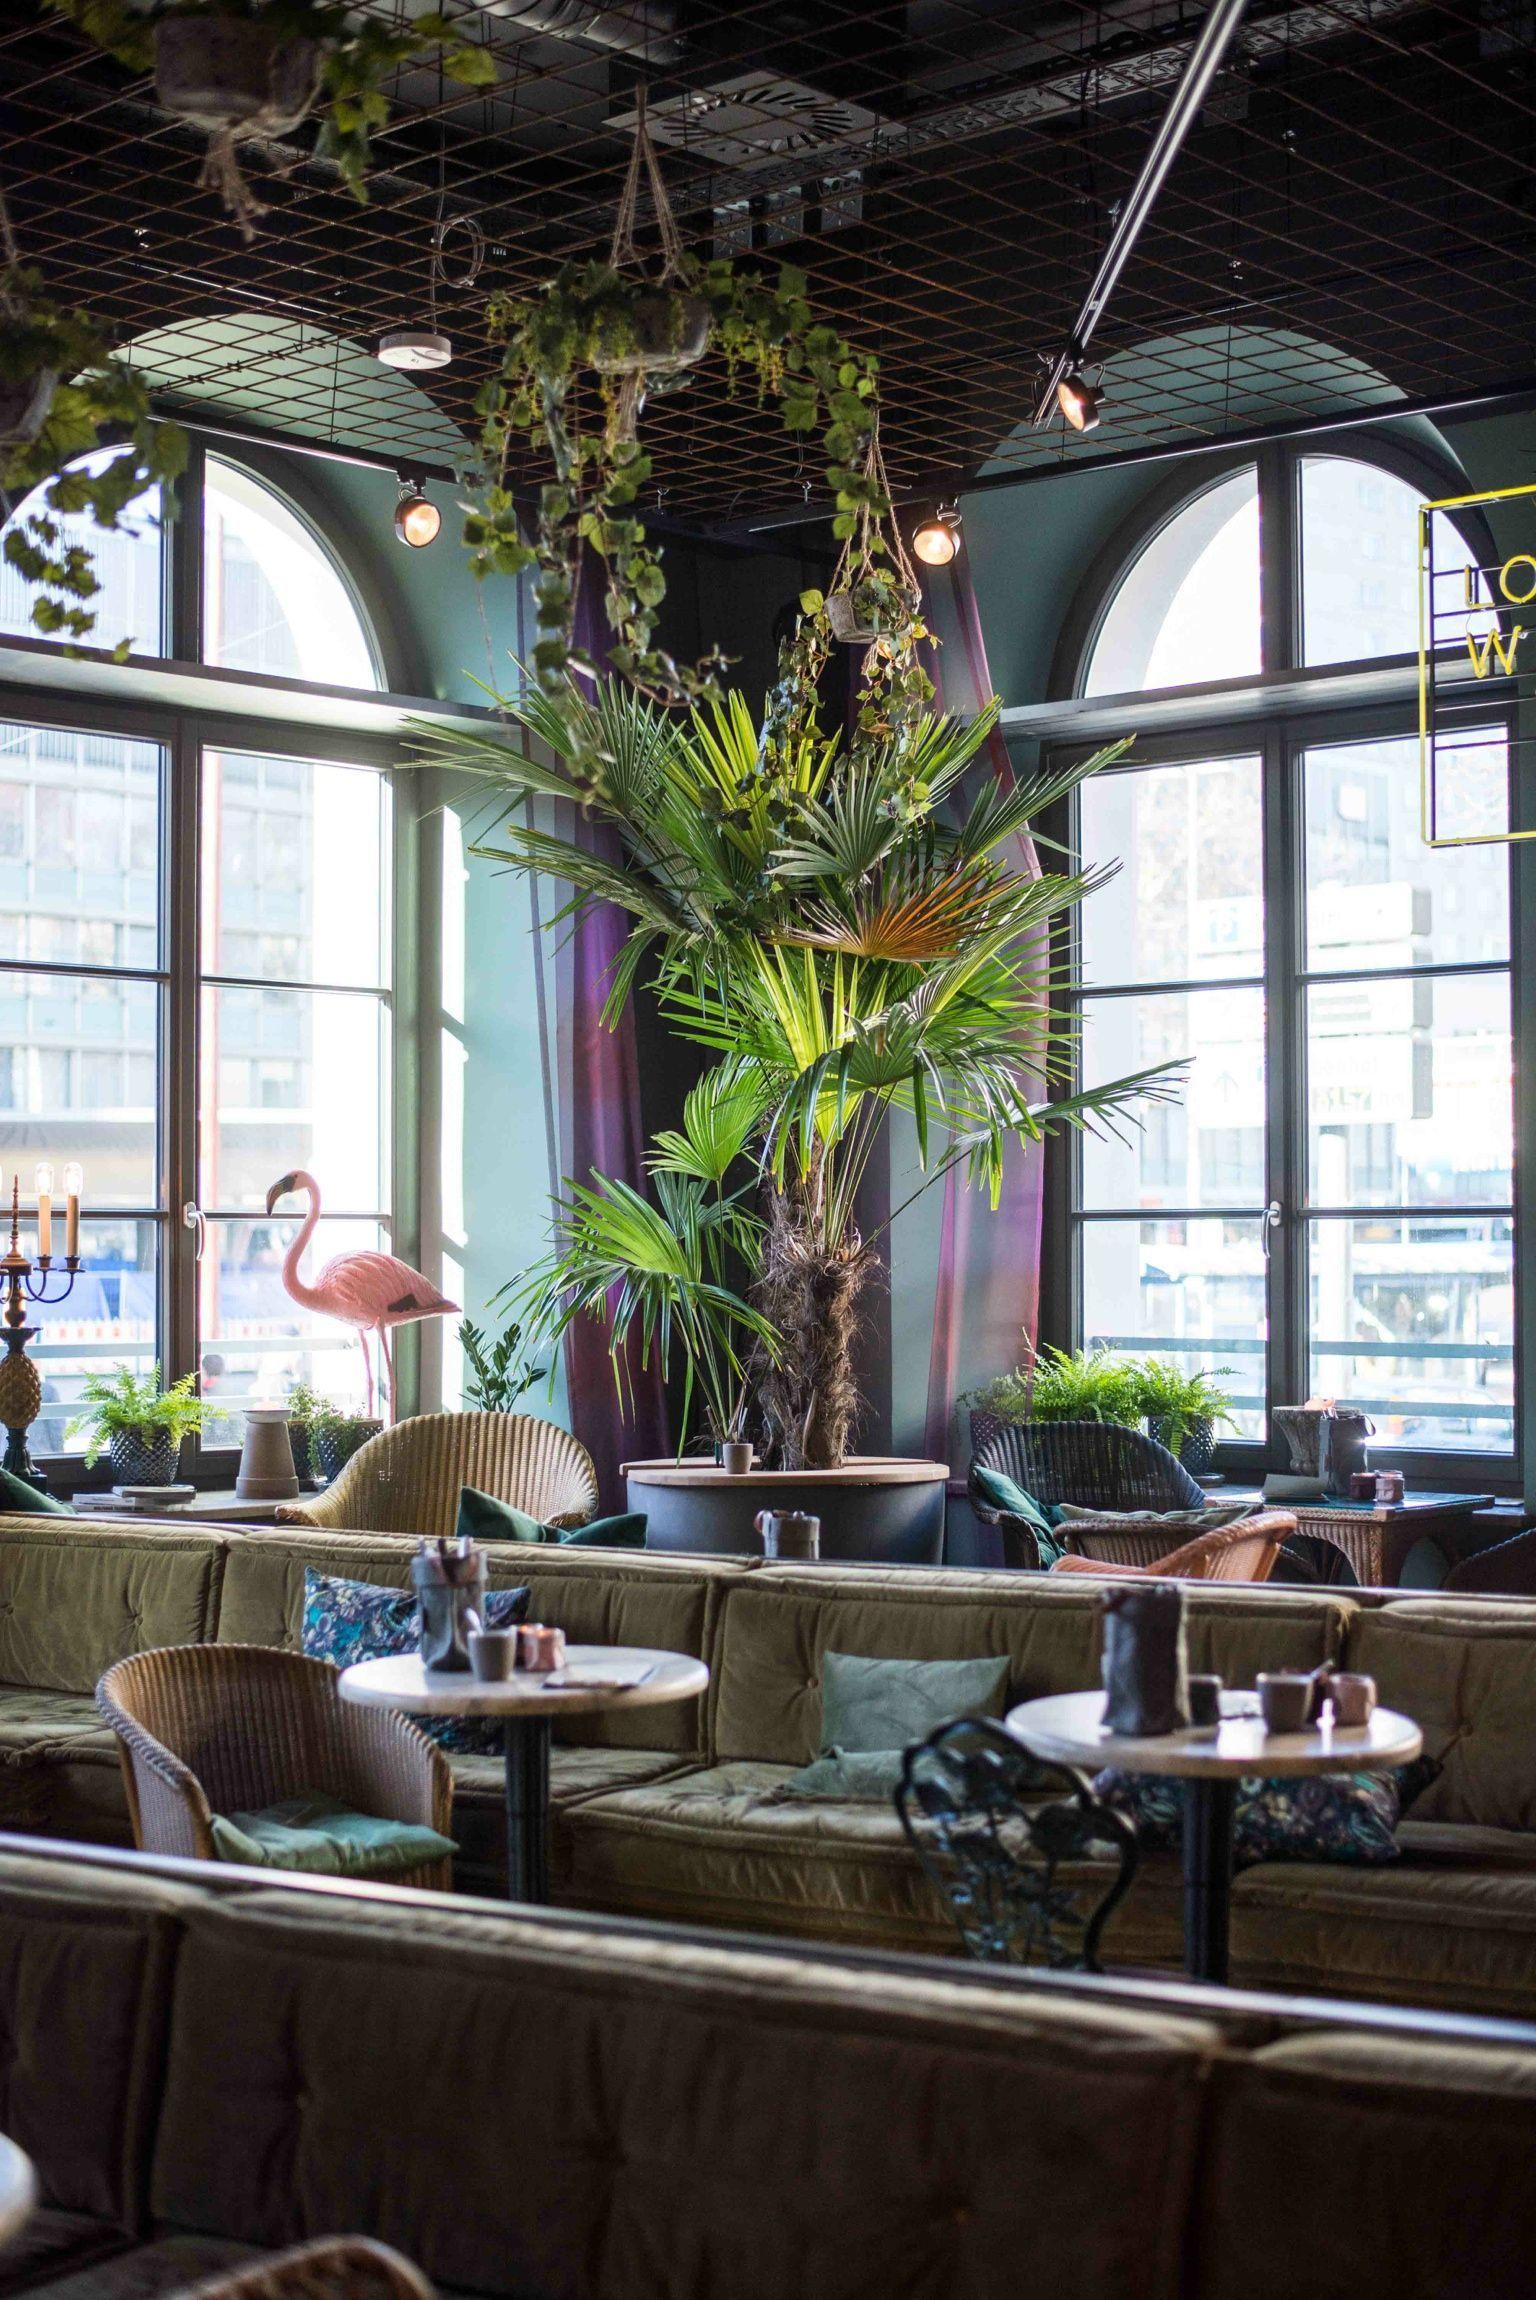 Top 5 Best Bars And Restaurants Transformations Vintage Restaurant Design Bar Restaurant Interior Dinner Restaurants